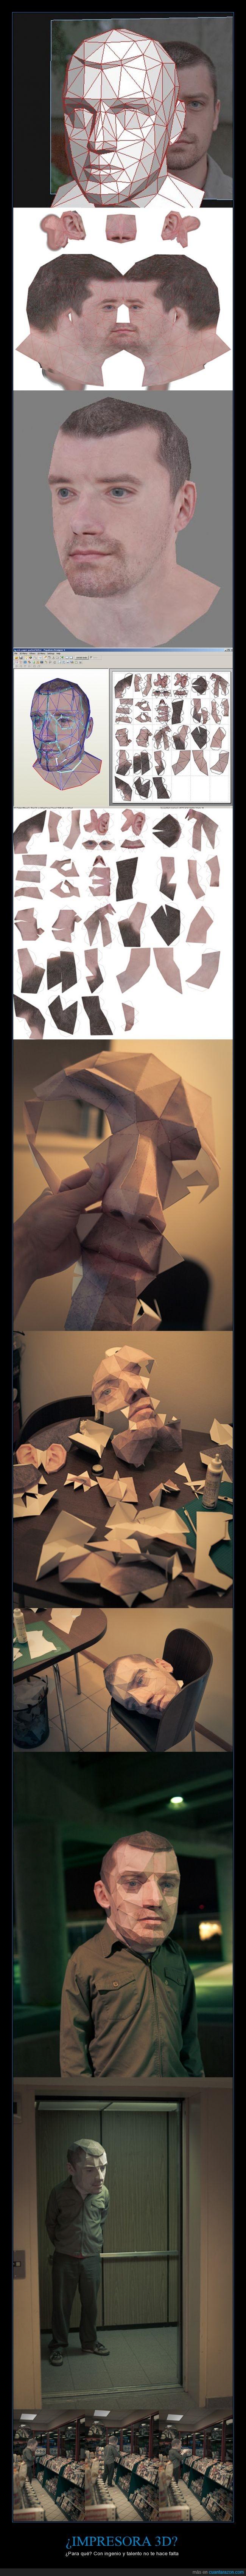 2d,3d,cabeza,cabezón,disfraz,ideas para halloween,impresora,máscara,origami,paciencia,papel,papercraft,polígonos,puzzle